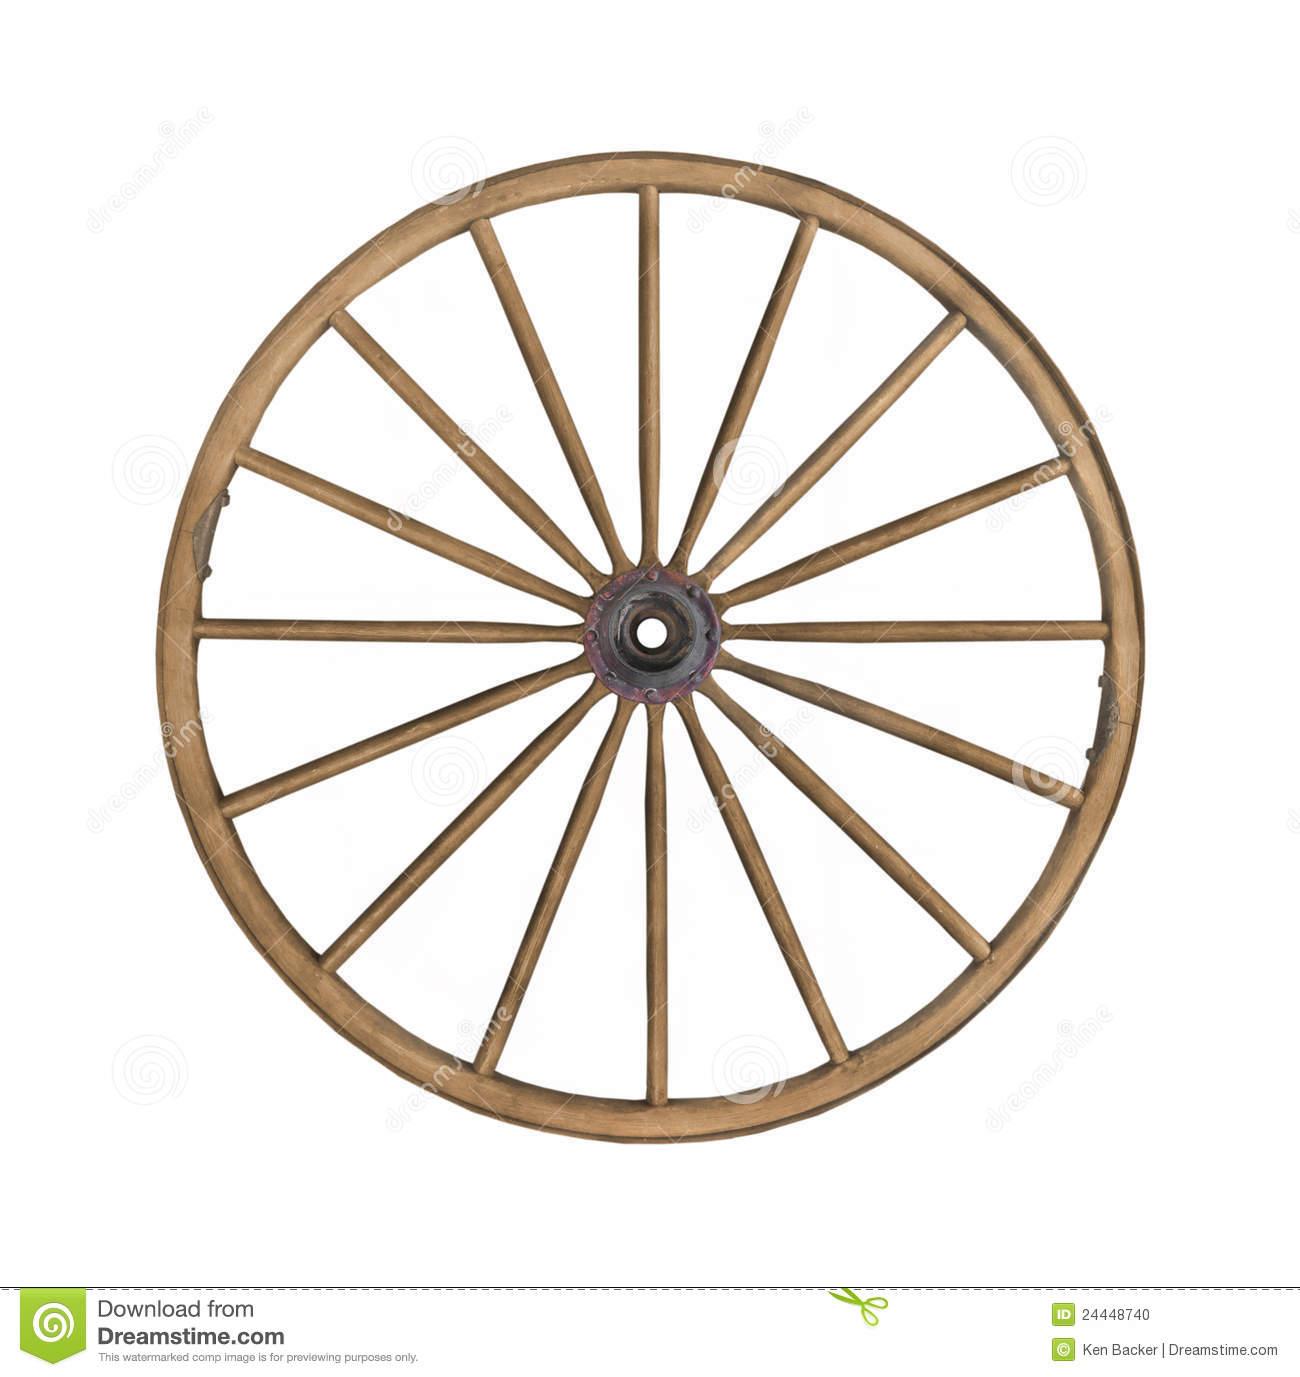 Wagon wheel drawing at getdrawings free for personal use wagon 1300x1377 wagon wheel drawing publicscrutiny Choice Image